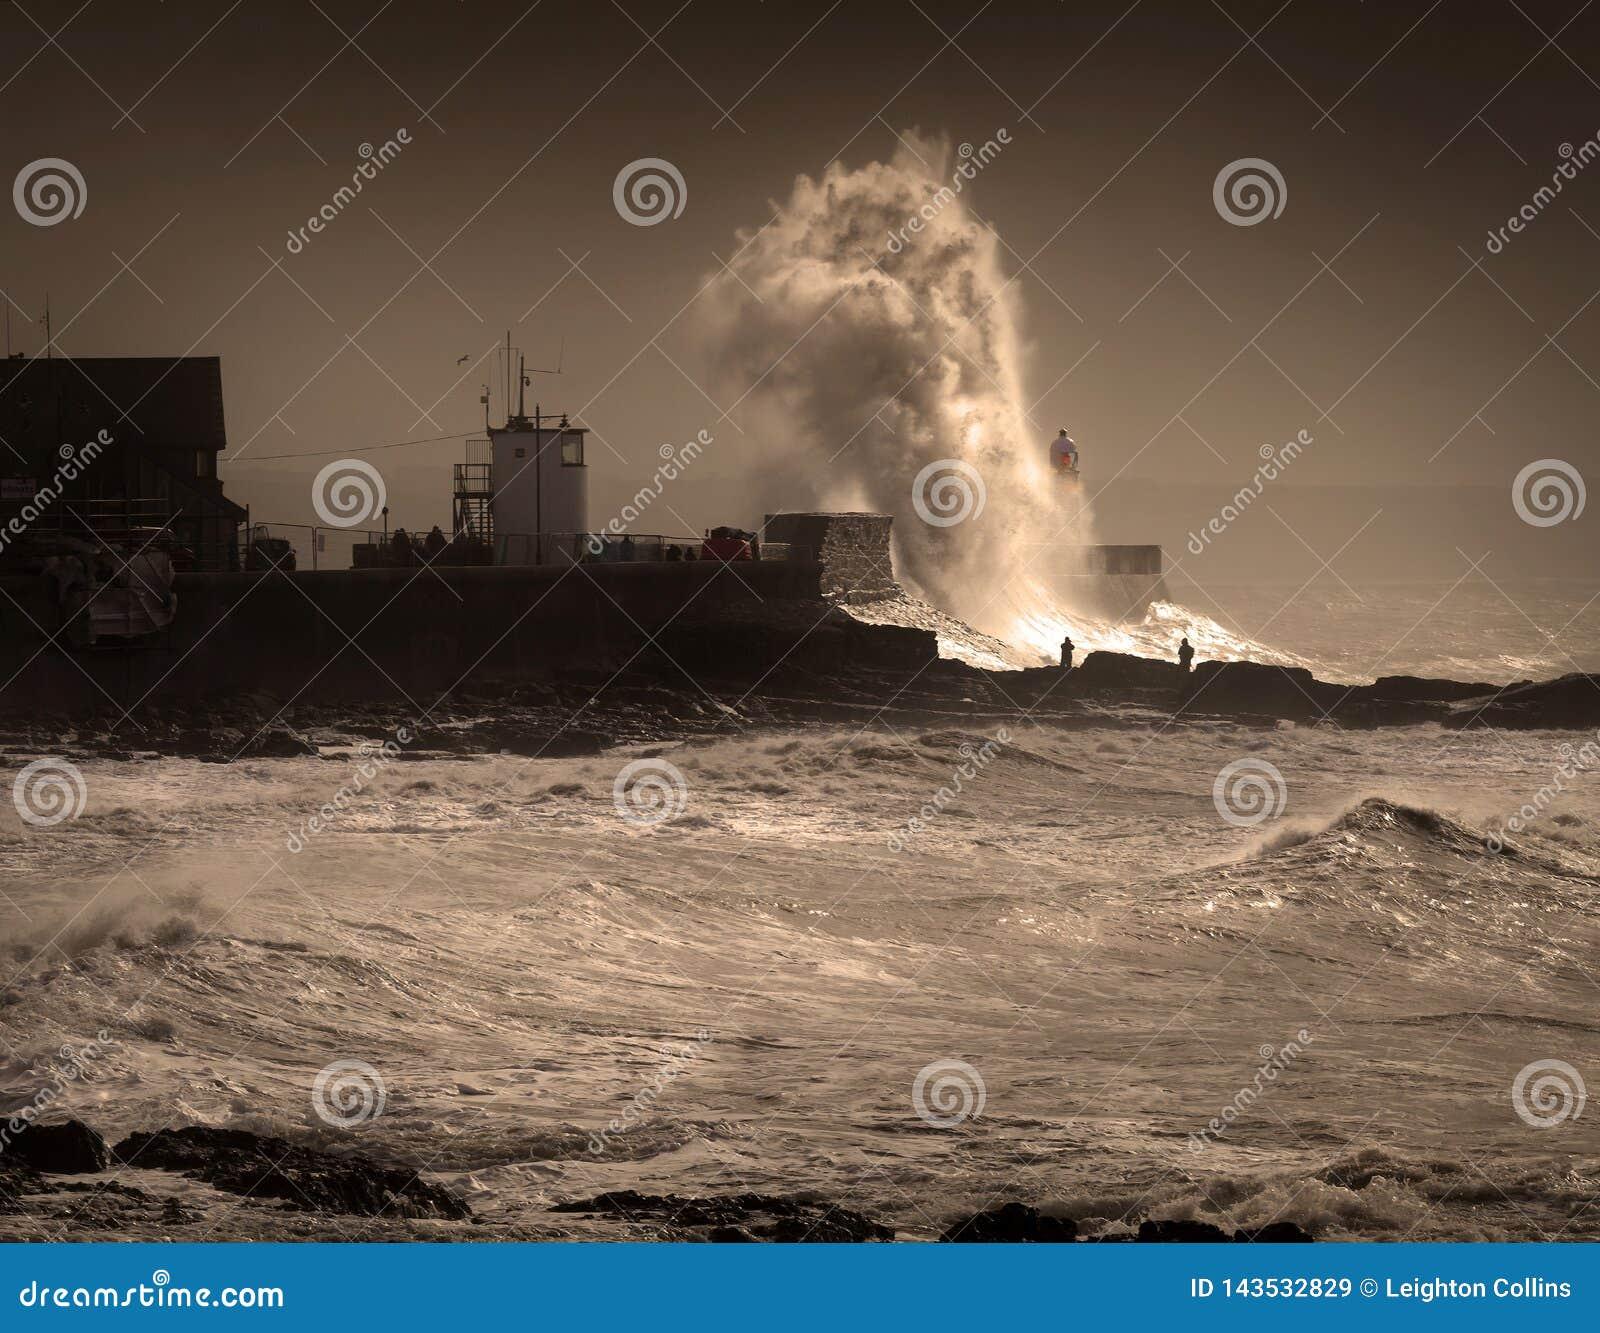 Storm Graham at Porthcawl lighthouse